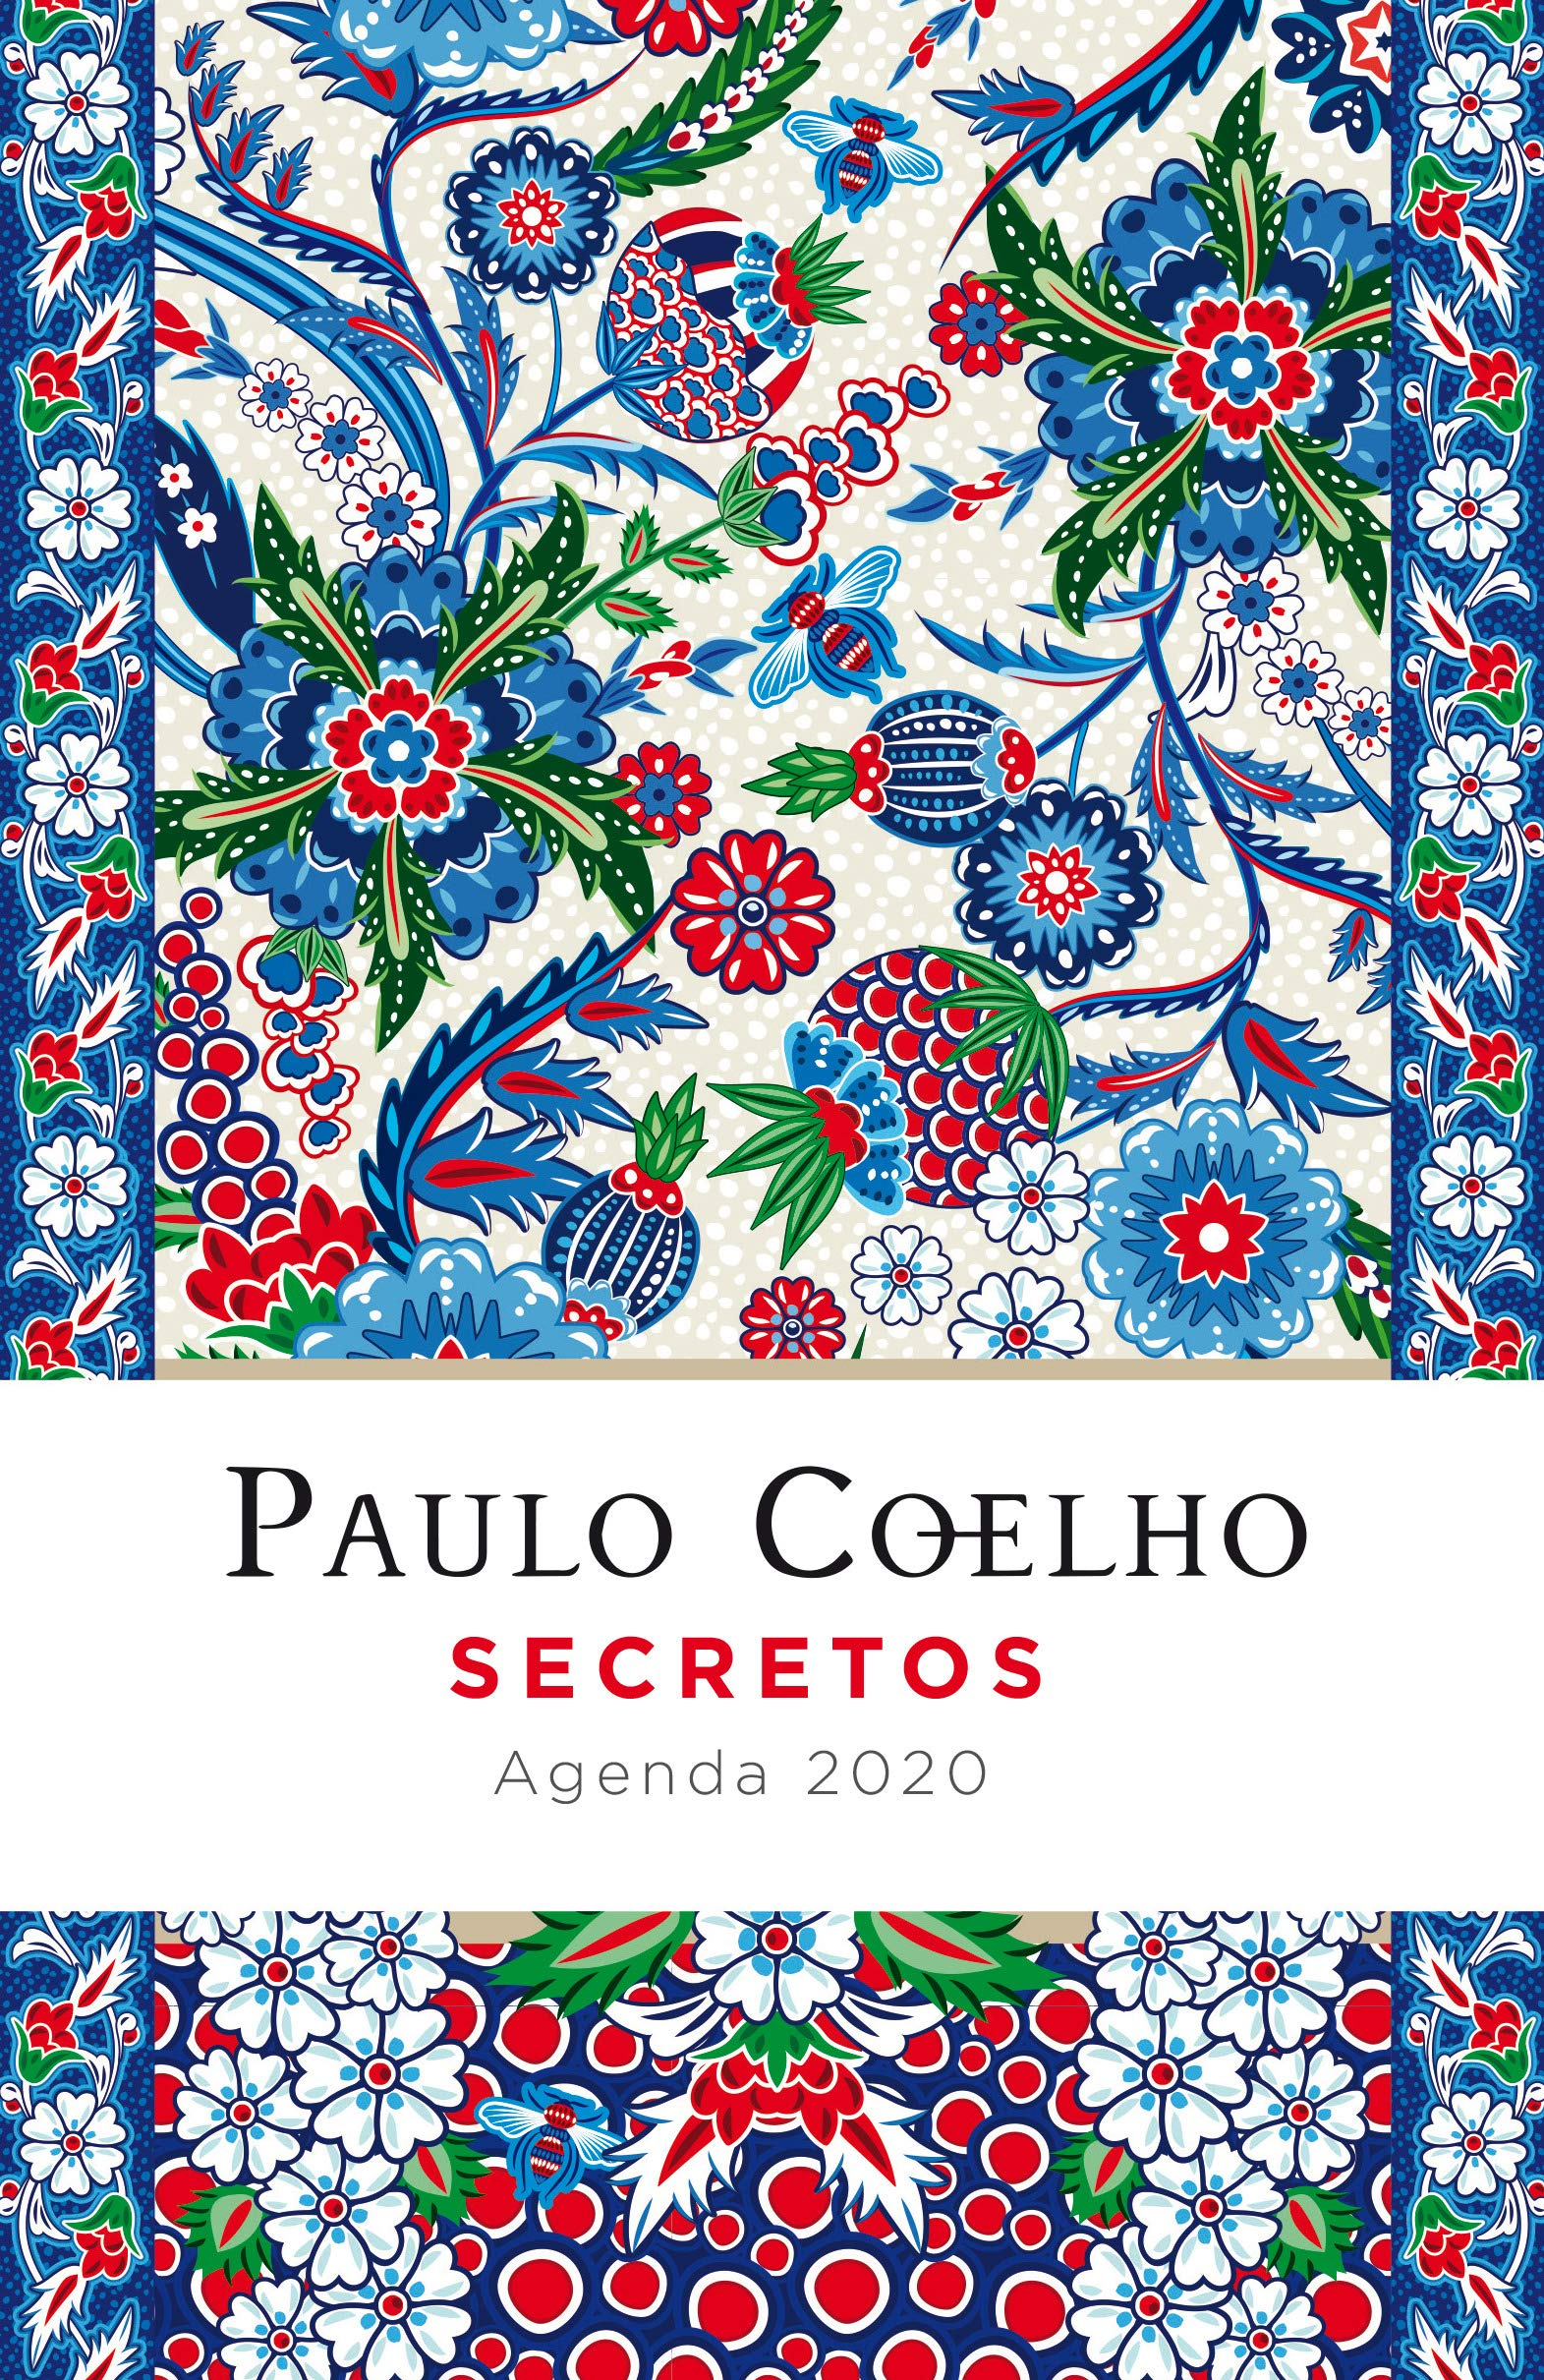 Secretos: Agenda 2020 (Spanish Edition): Paulo Coelho ...